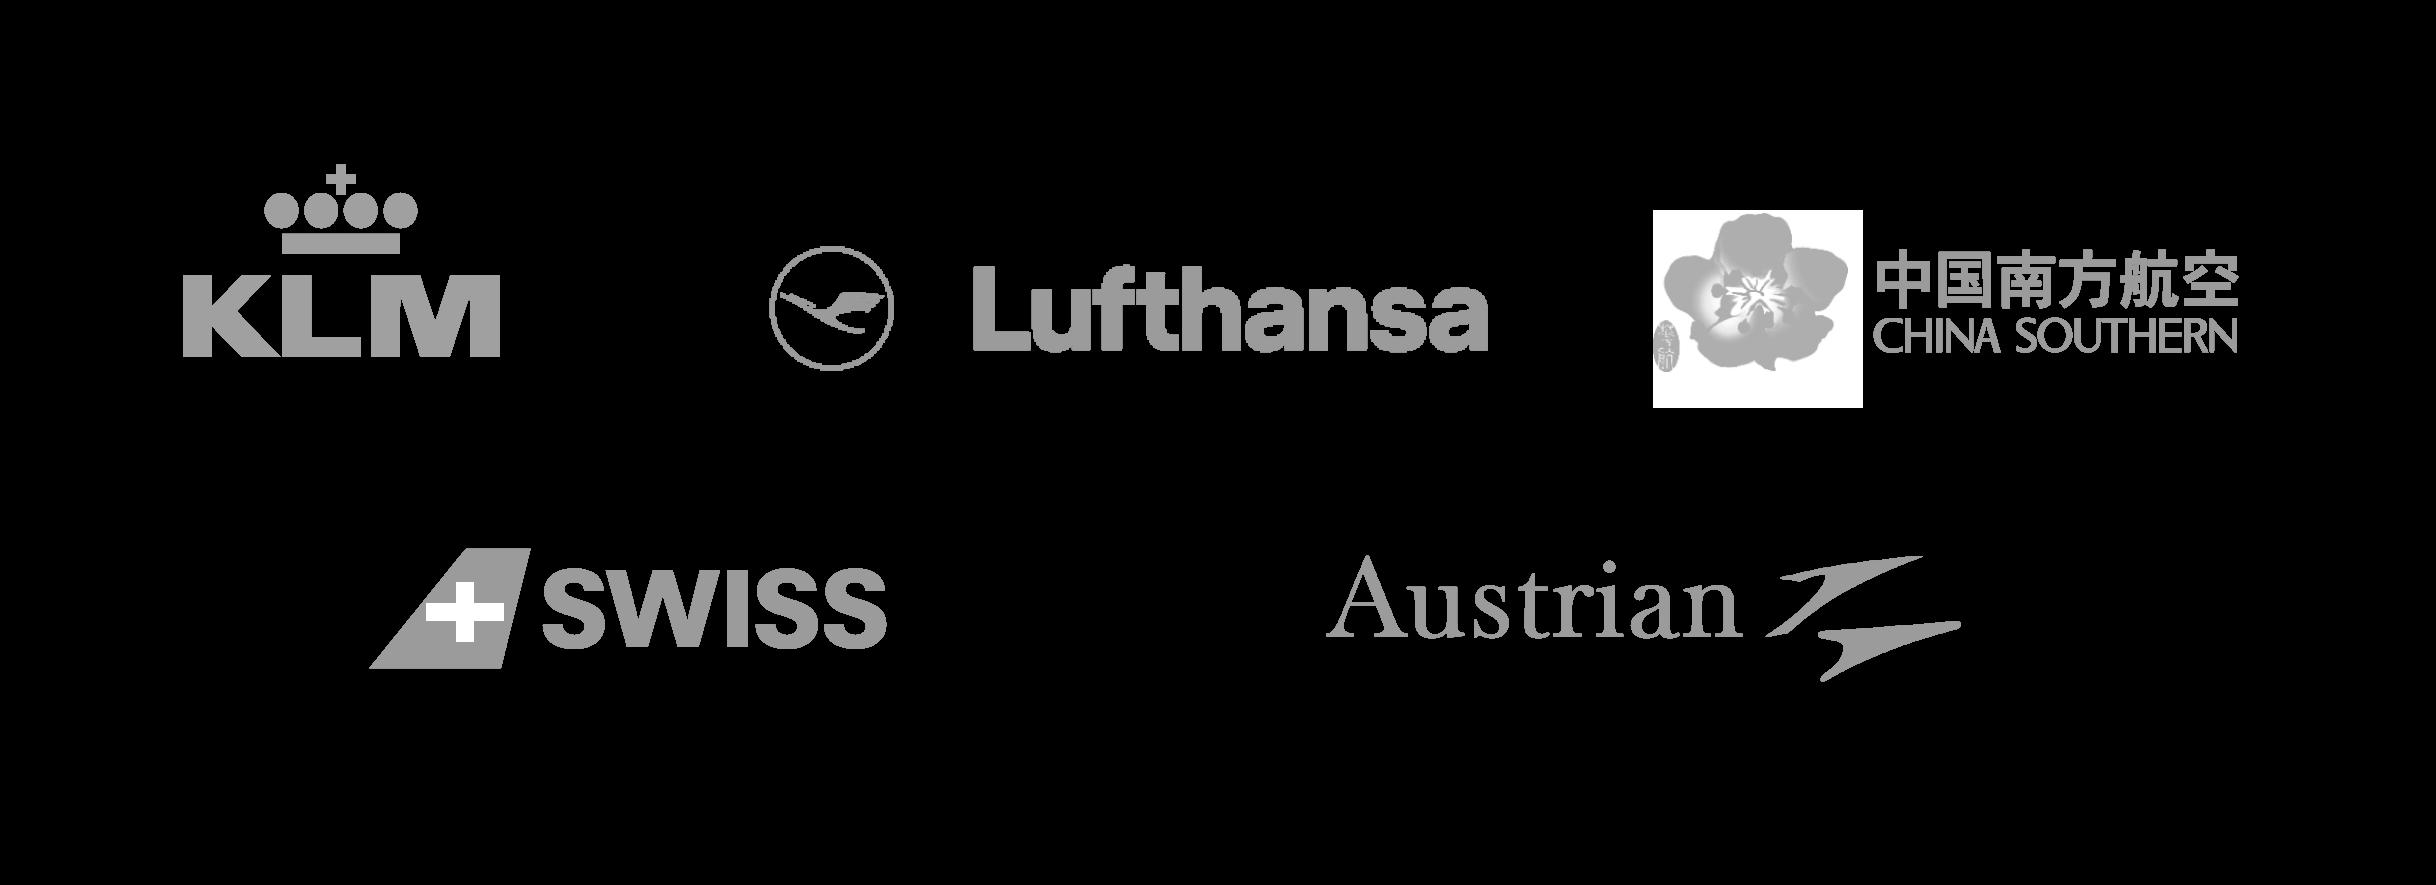 Logos BAGTAG